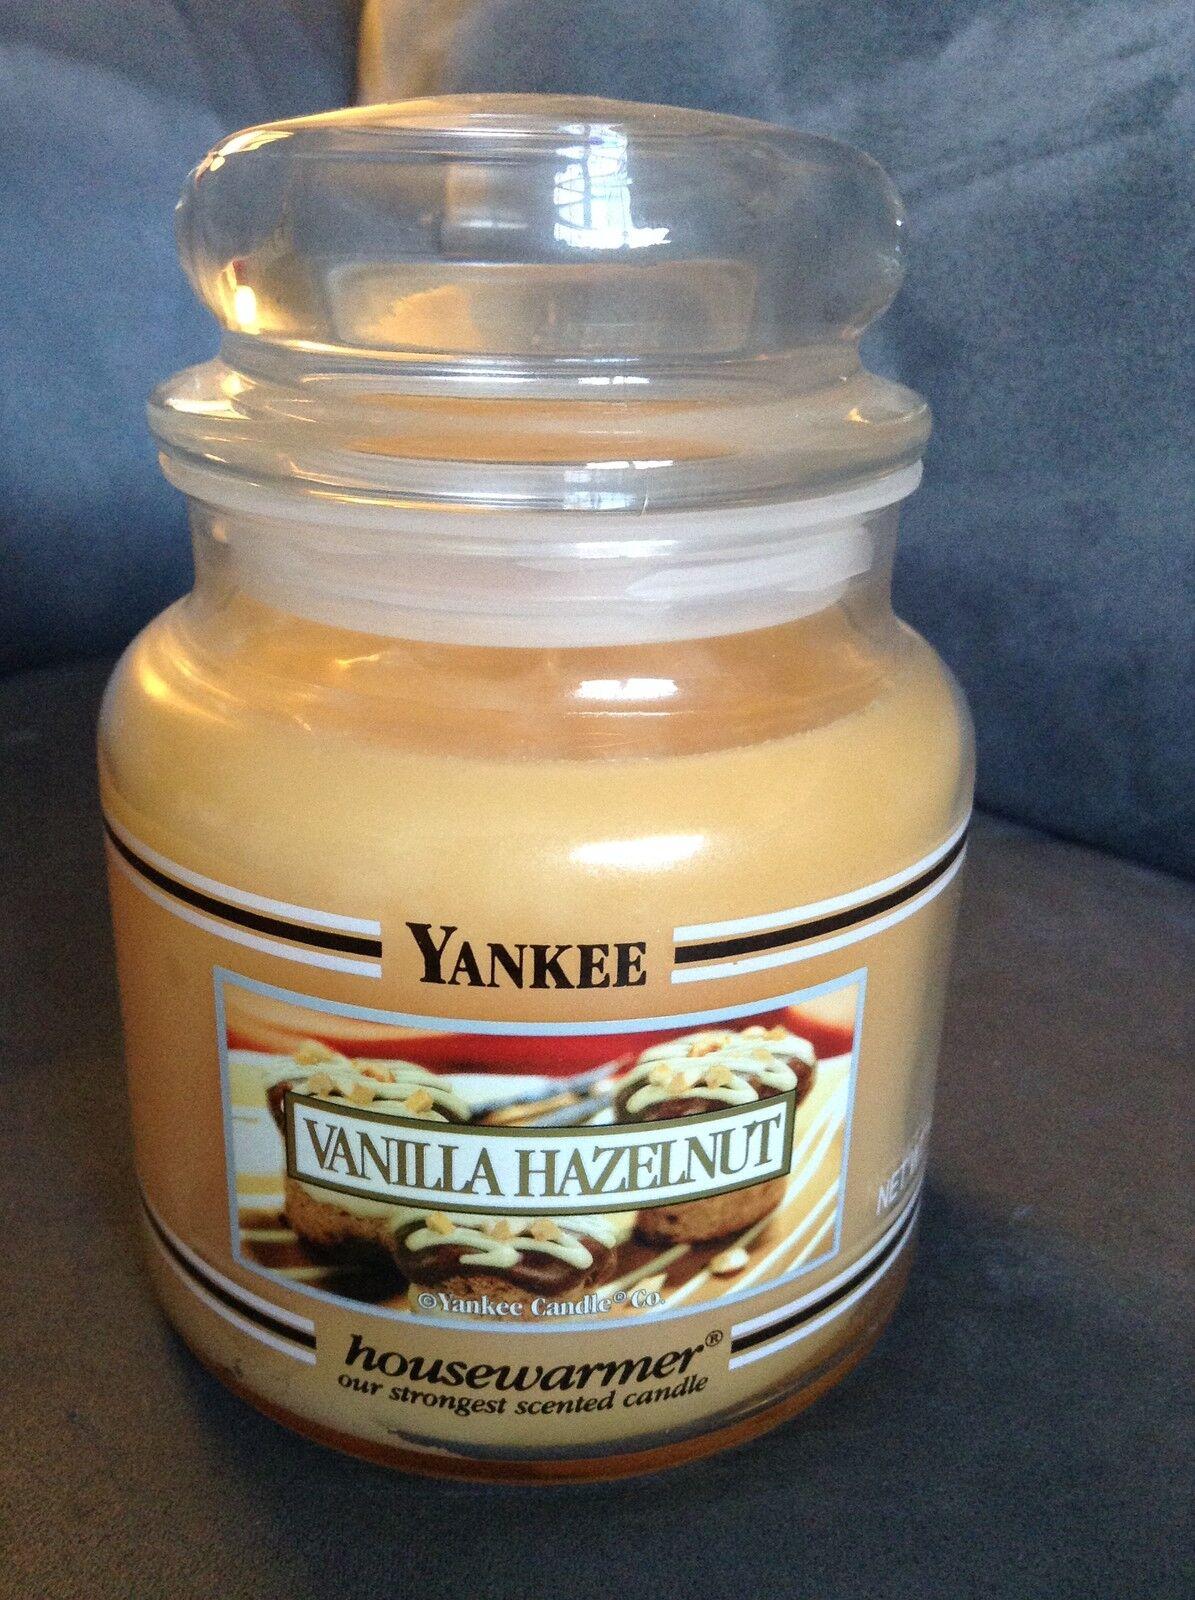 YANKEE CANDLE VANILLA HAZELNUT 14.5 OZ JAR - VERY RARE - BRAND NEW